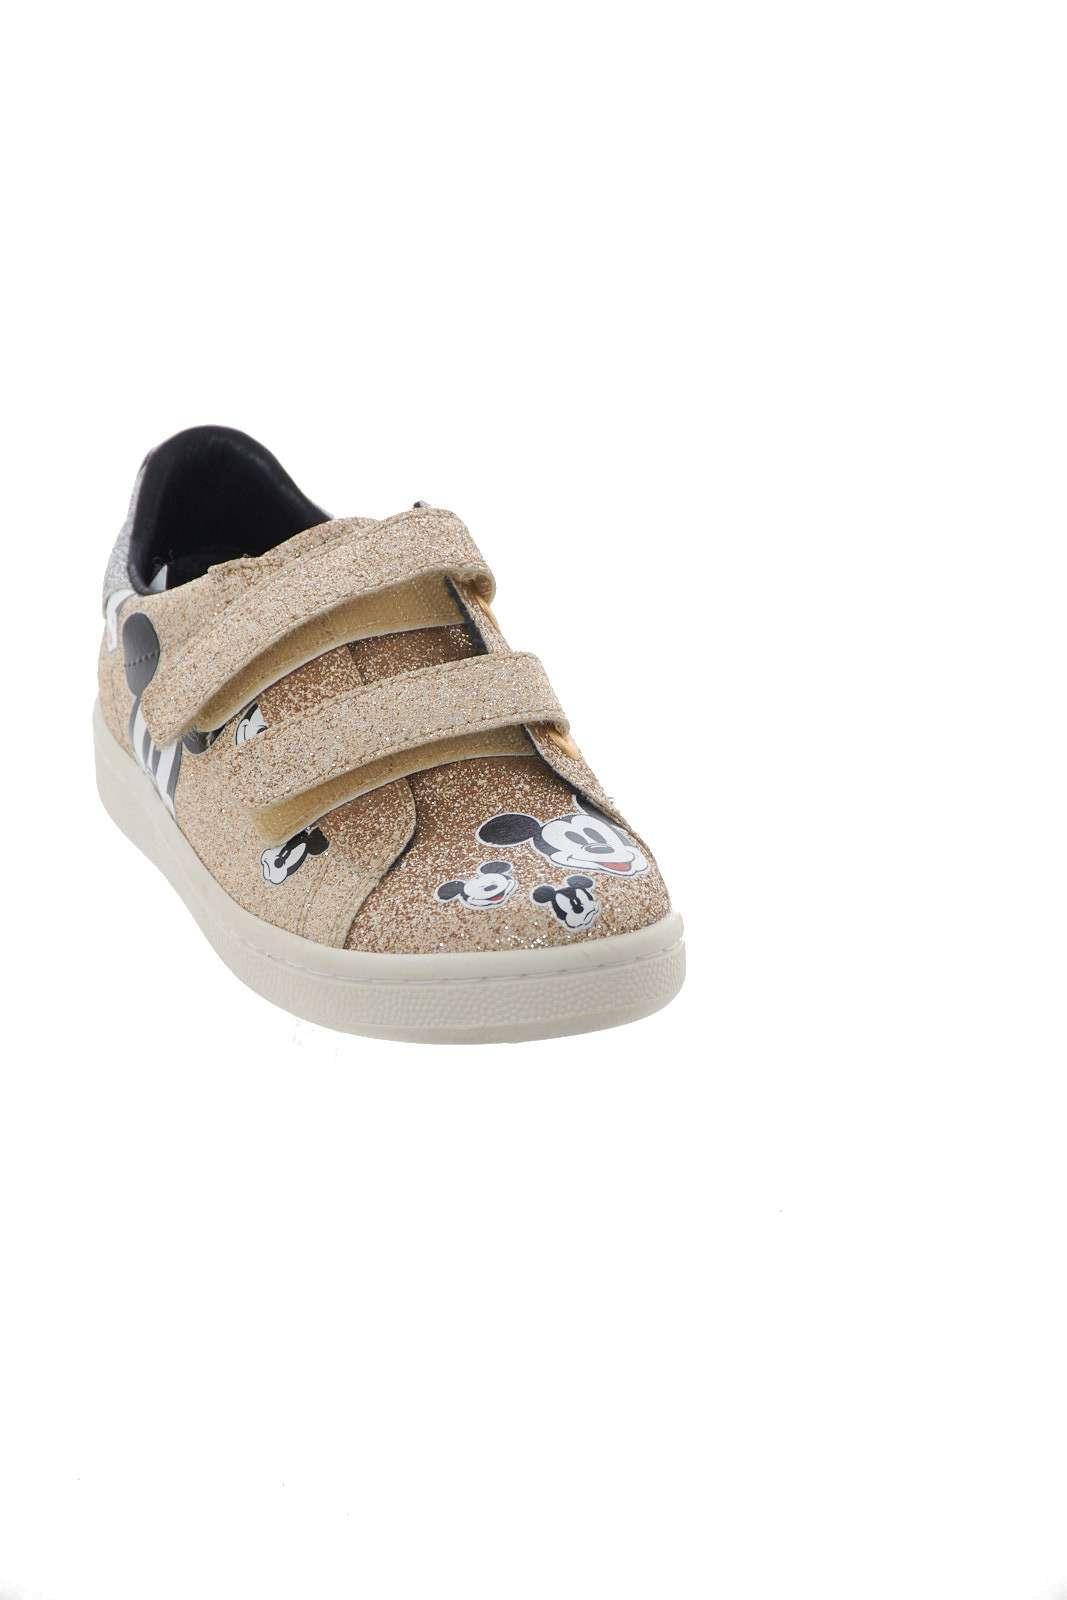 https://www.parmax.com/media/catalog/product/A/I/AI-outlet_parmax-scarpe-bambina-MoaConcept-MDJ269-C_1.jpg